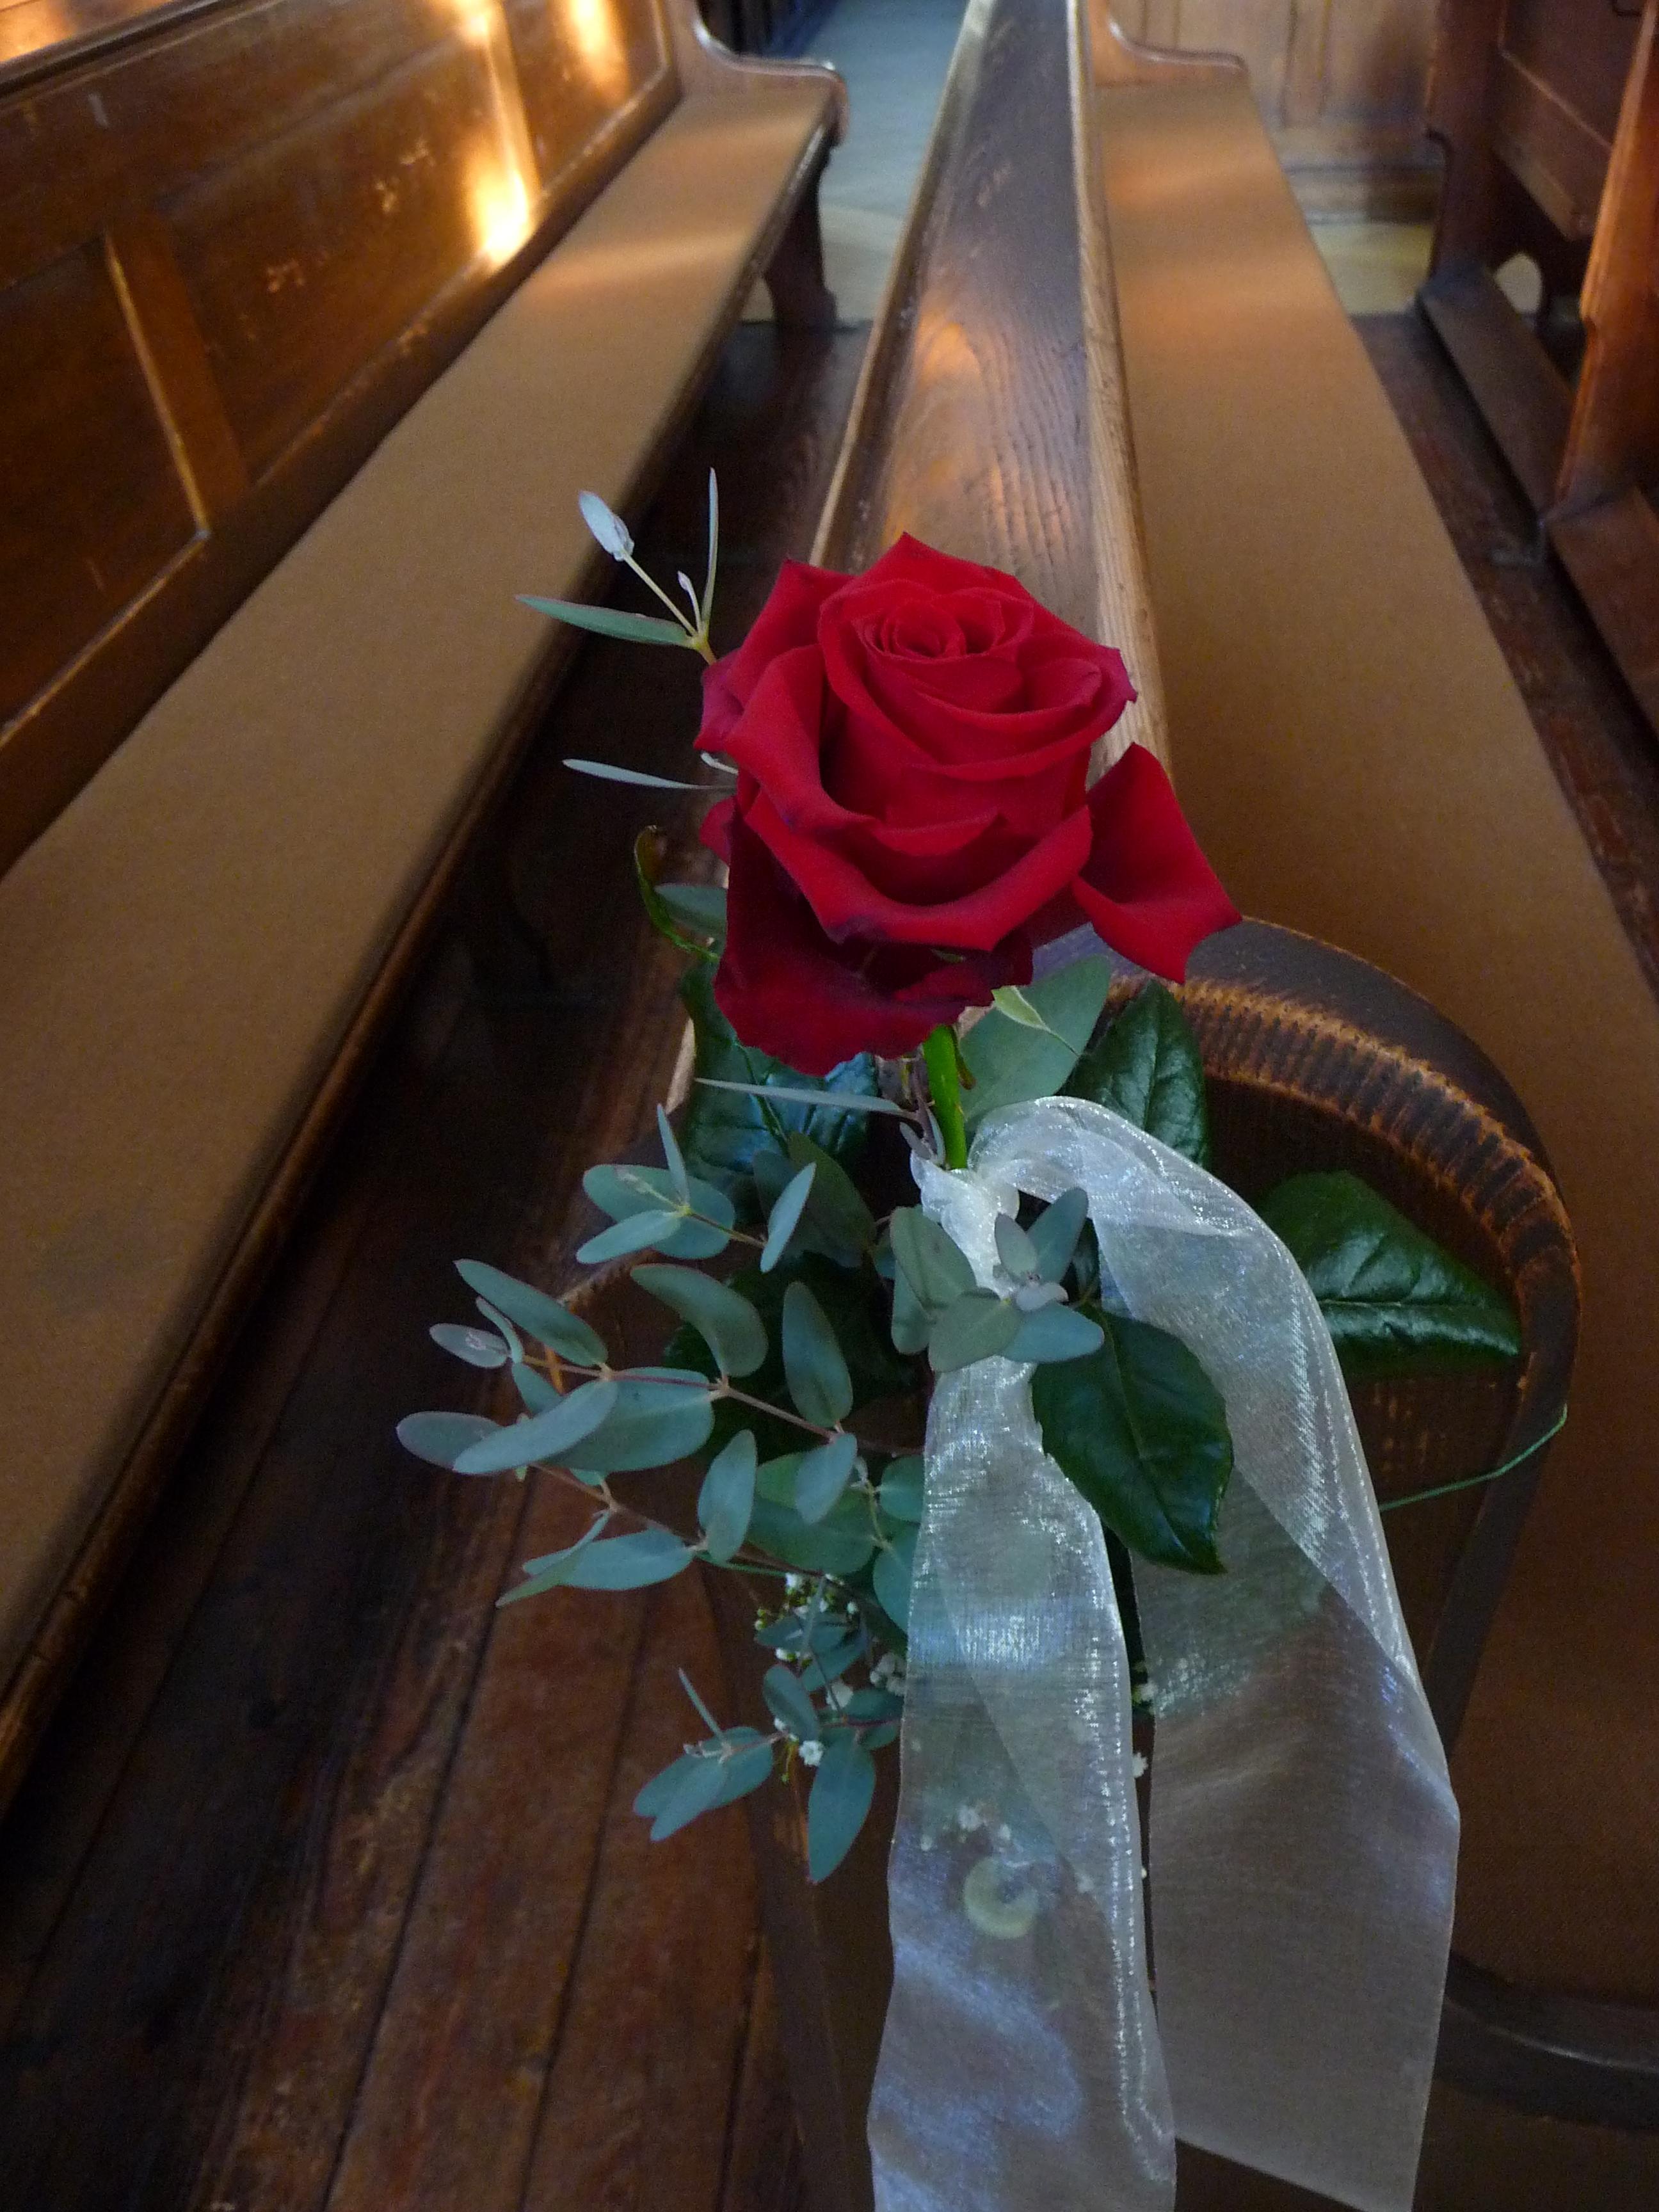 File:Kirchenschmuck Hochzeit.JPG - Wikimedia Commons